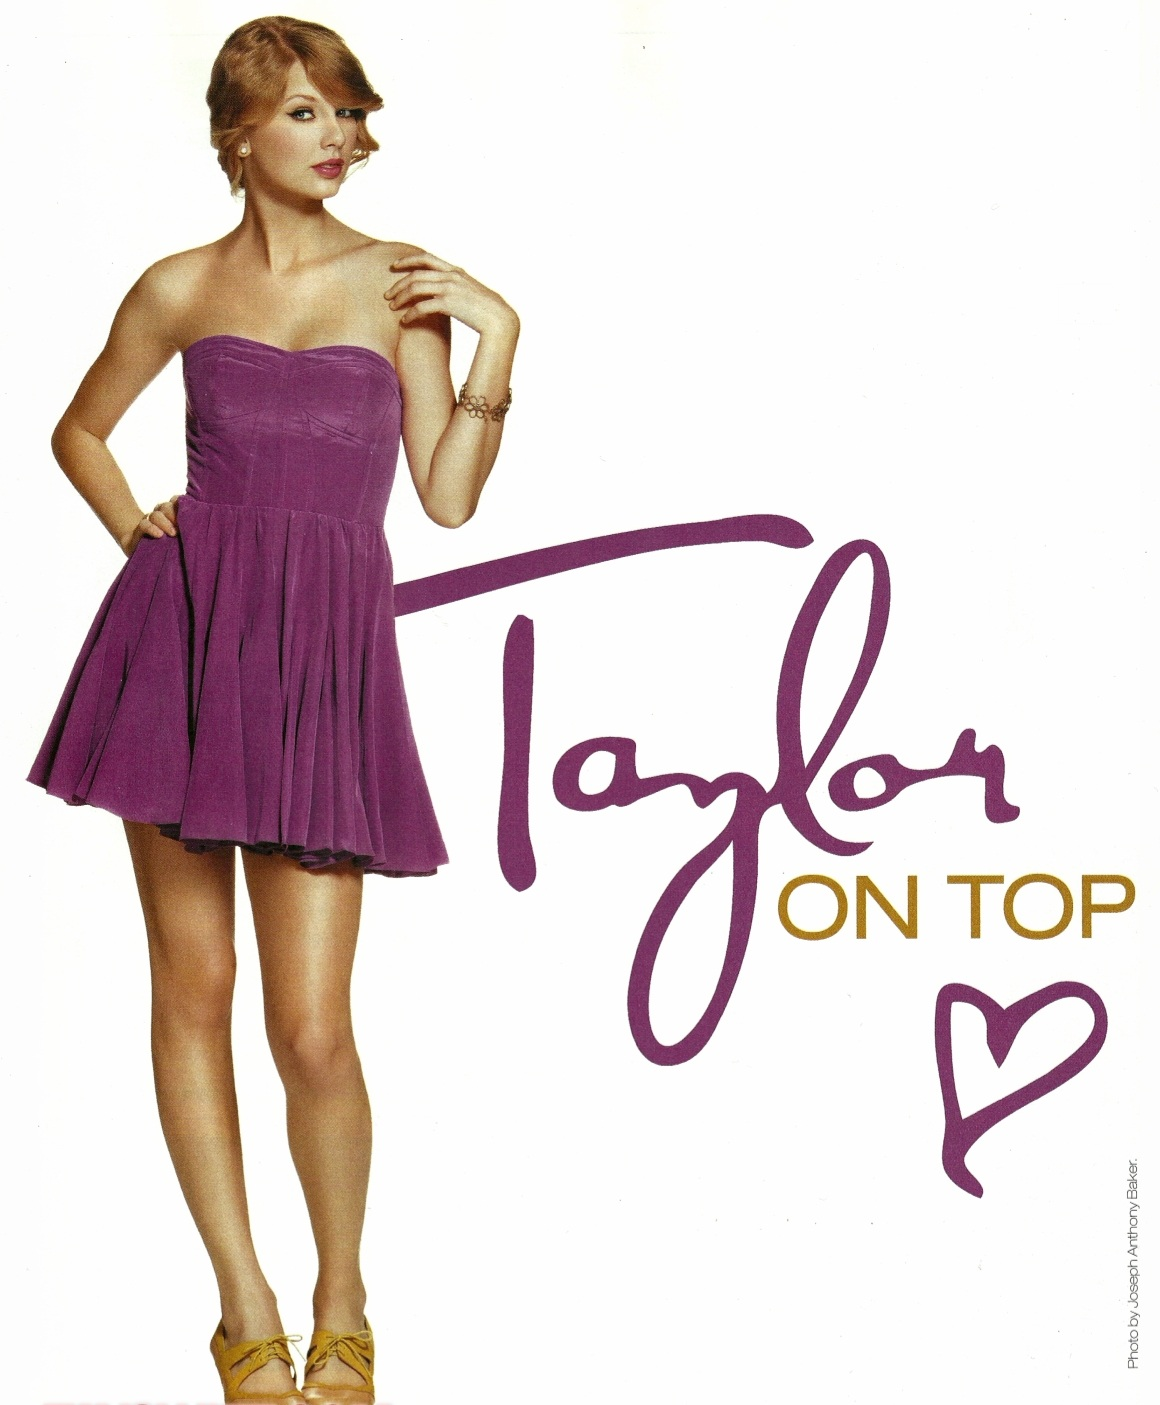 519241150_Taylor_Swift_Nashville_Lifestyles_September_2011_3_122_522lo.jpg